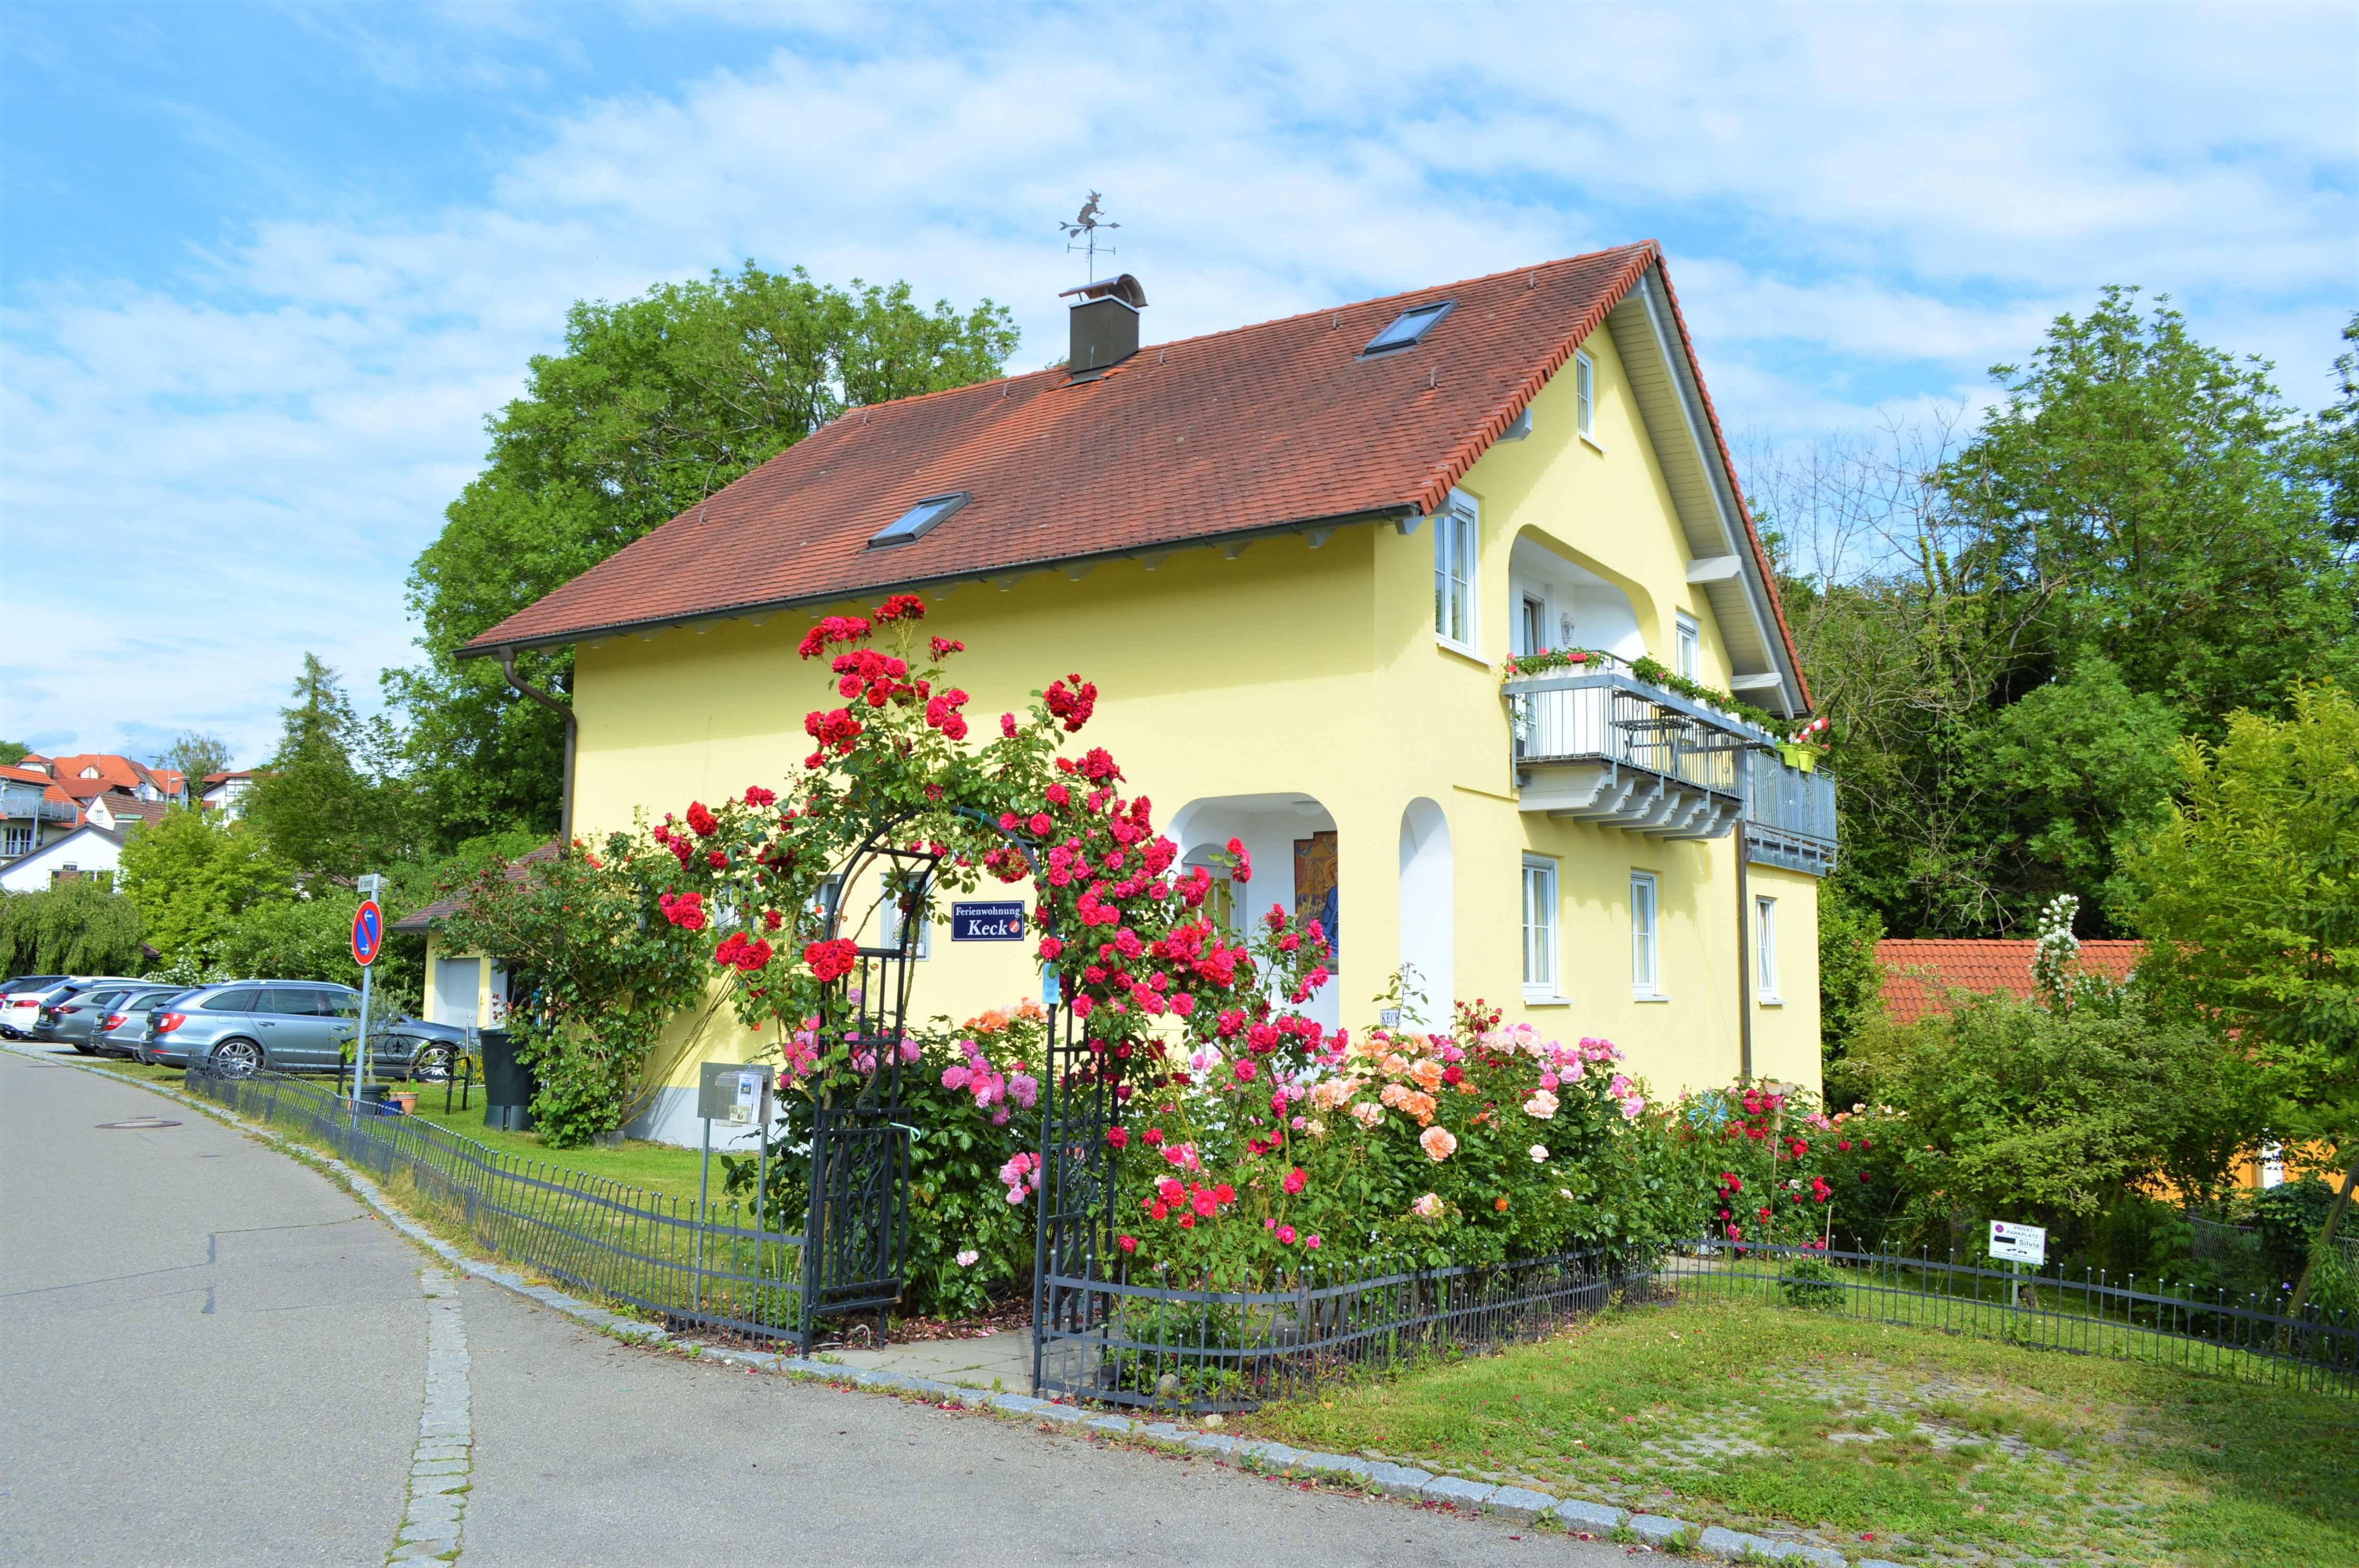 Keck Ferienwohnungen In Meersburg